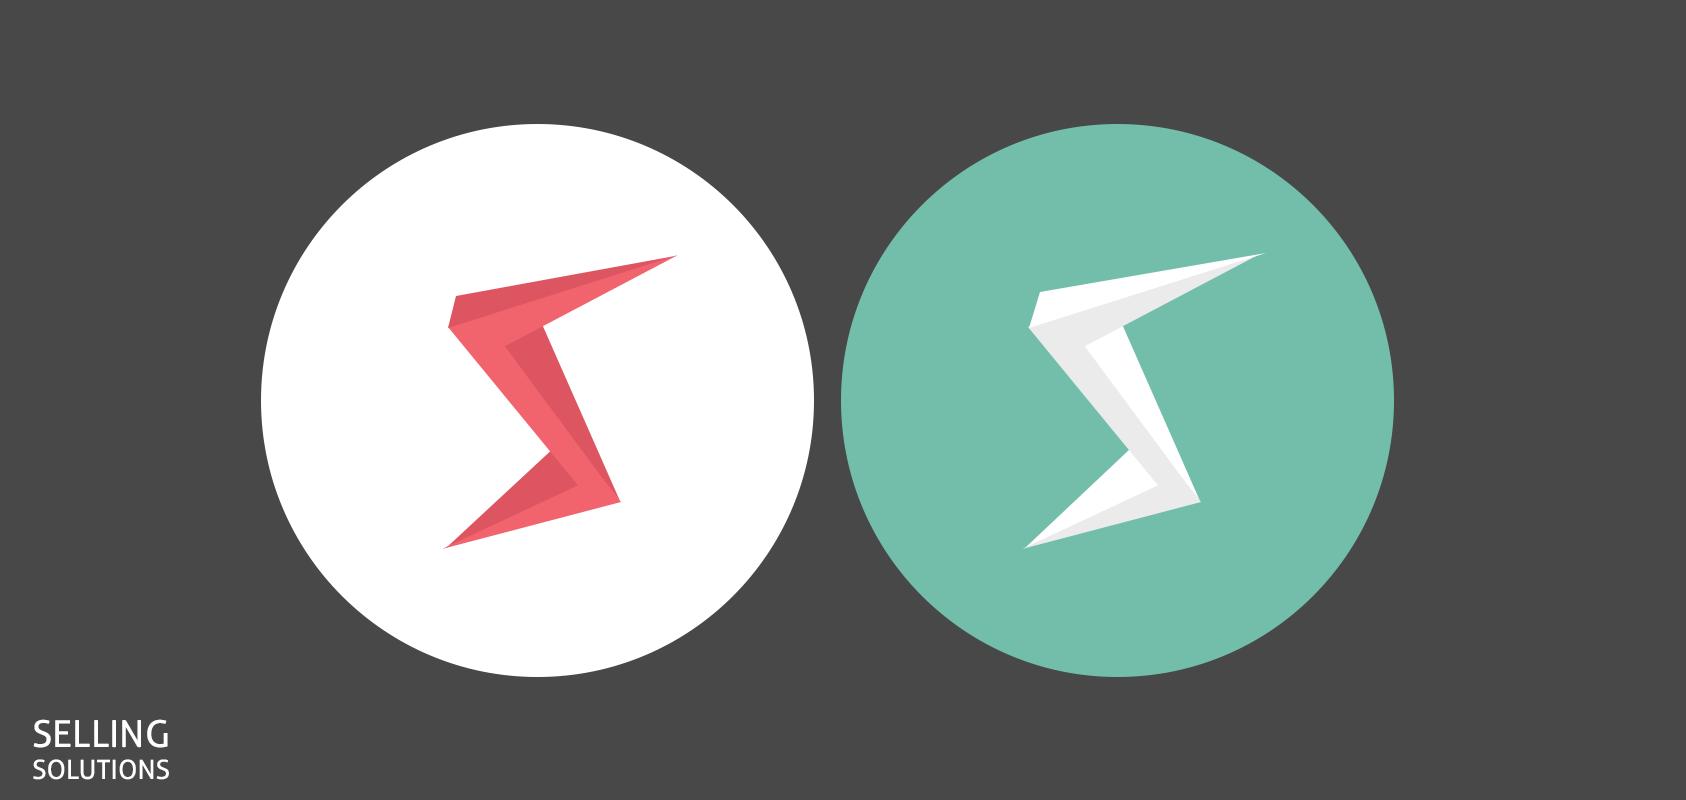 Using Flat Design in Logos  Tailor Brands